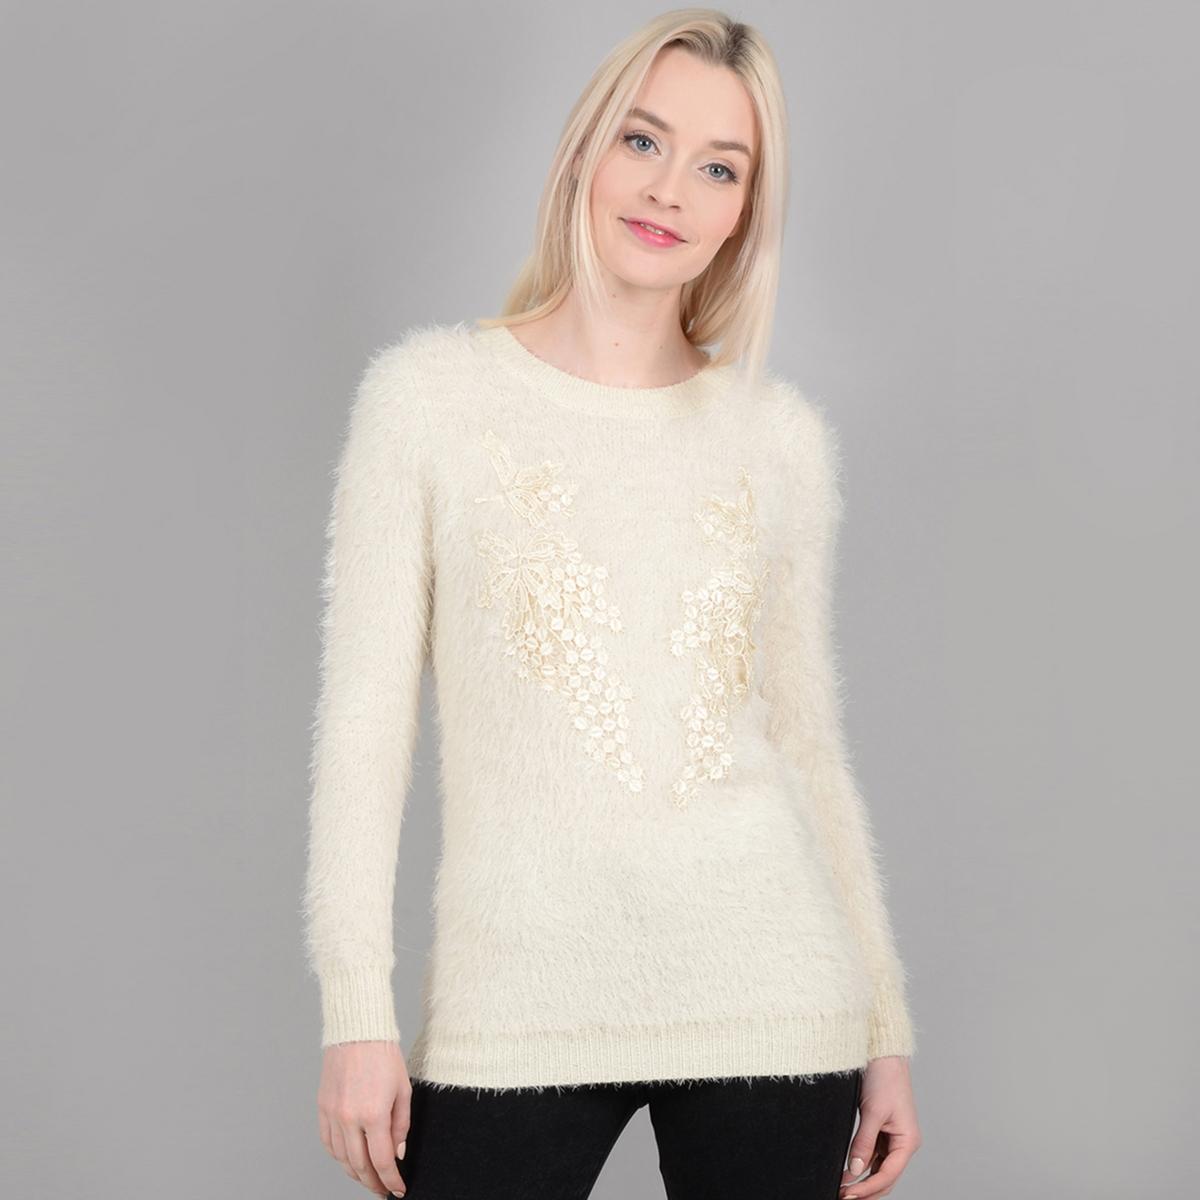 Пуловер MOLLY BRACKEN 12182504 от LaRedoute